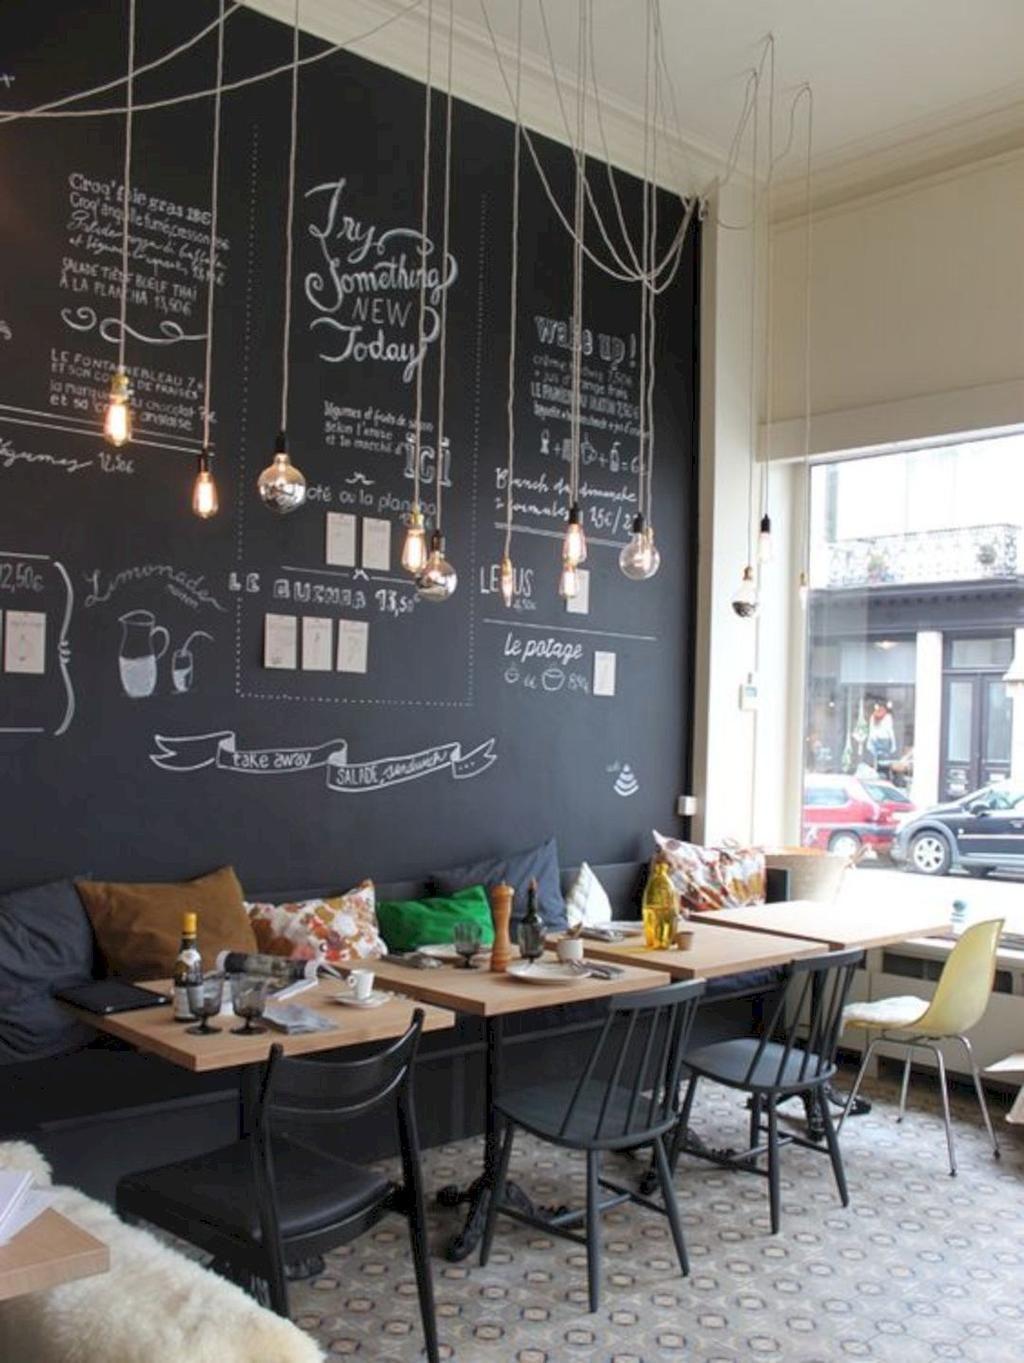 Cafe Style Cafe Interior Design Coffee Shop Decor Cafe Decor